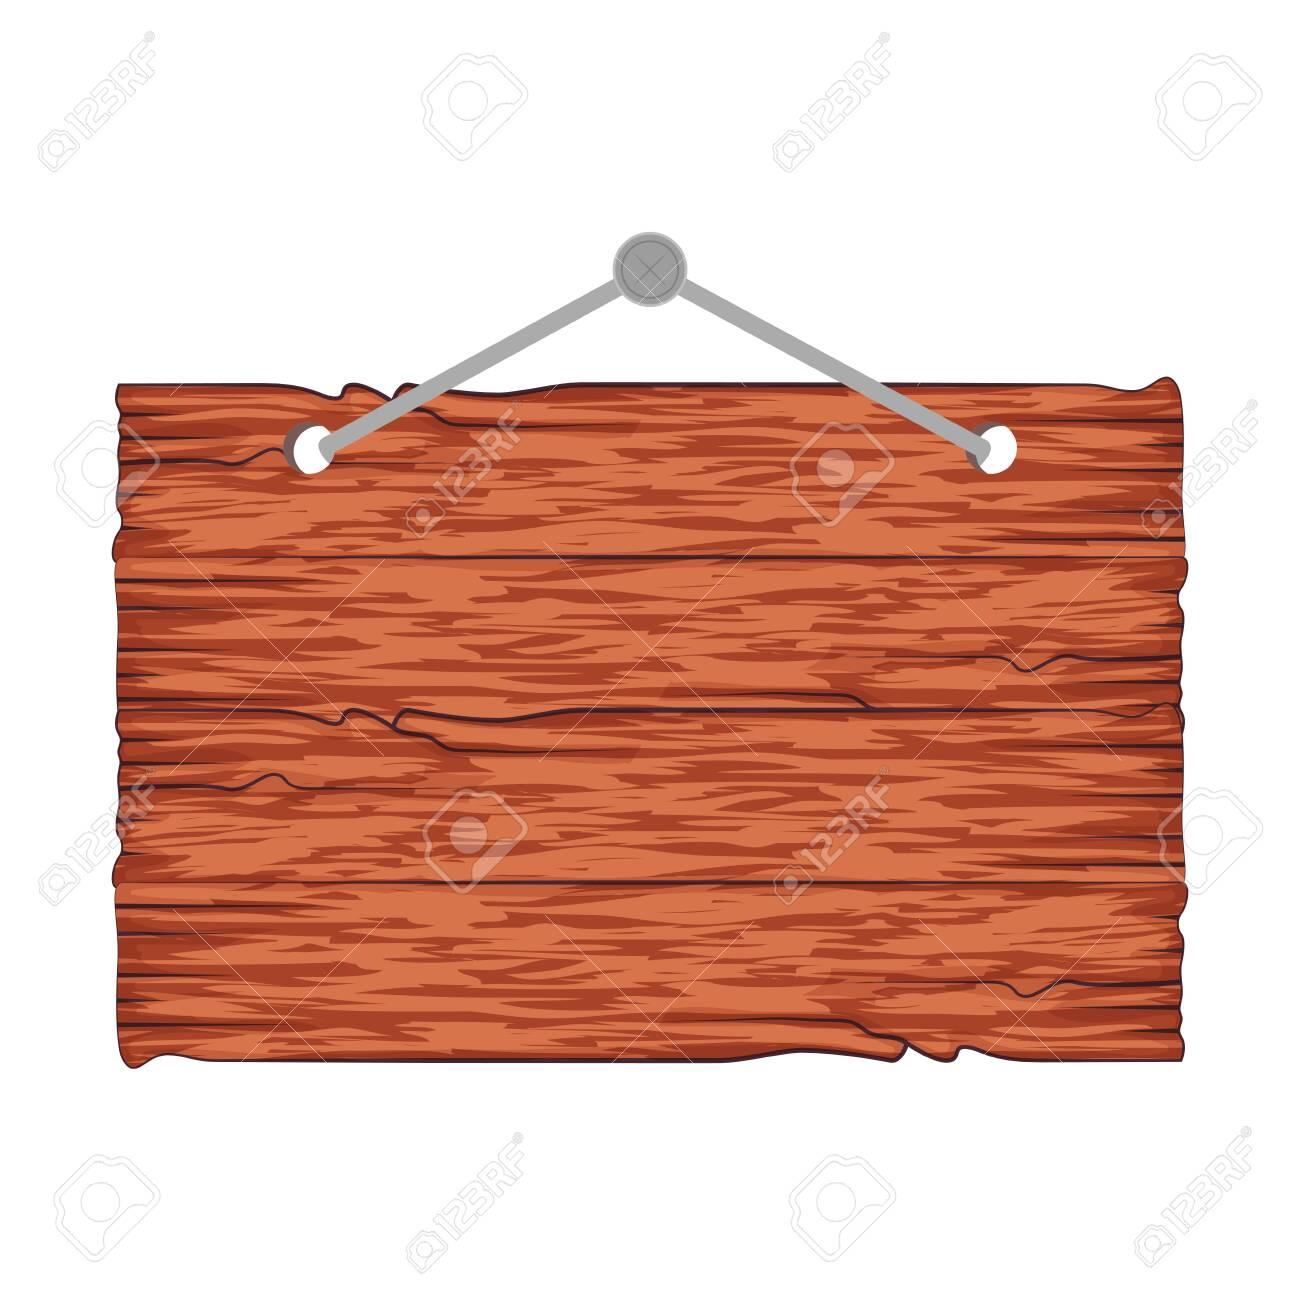 wooden label hanging icon vector illustration design - 133058232